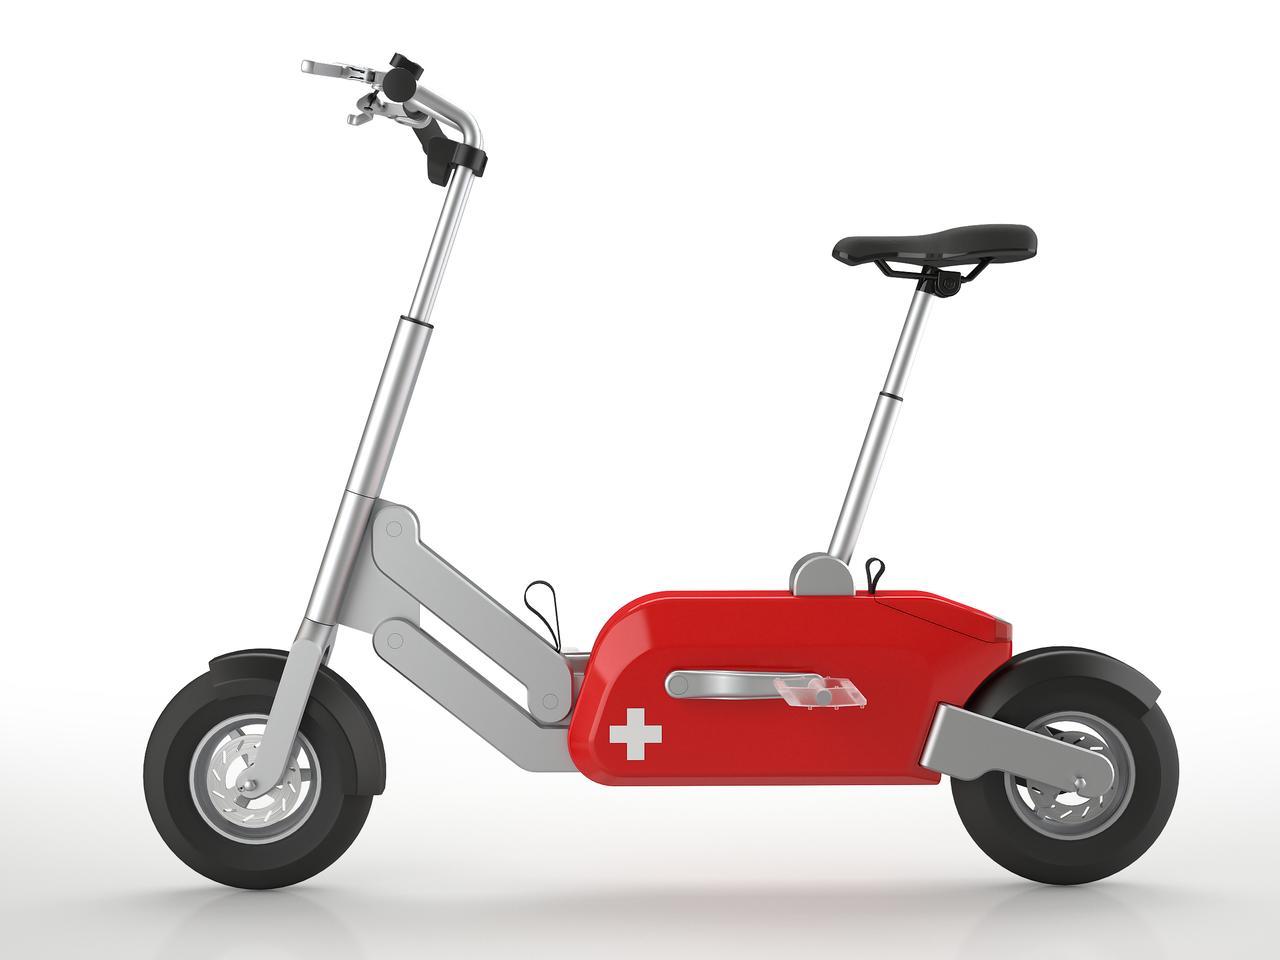 The new Voltitude pedelec bike